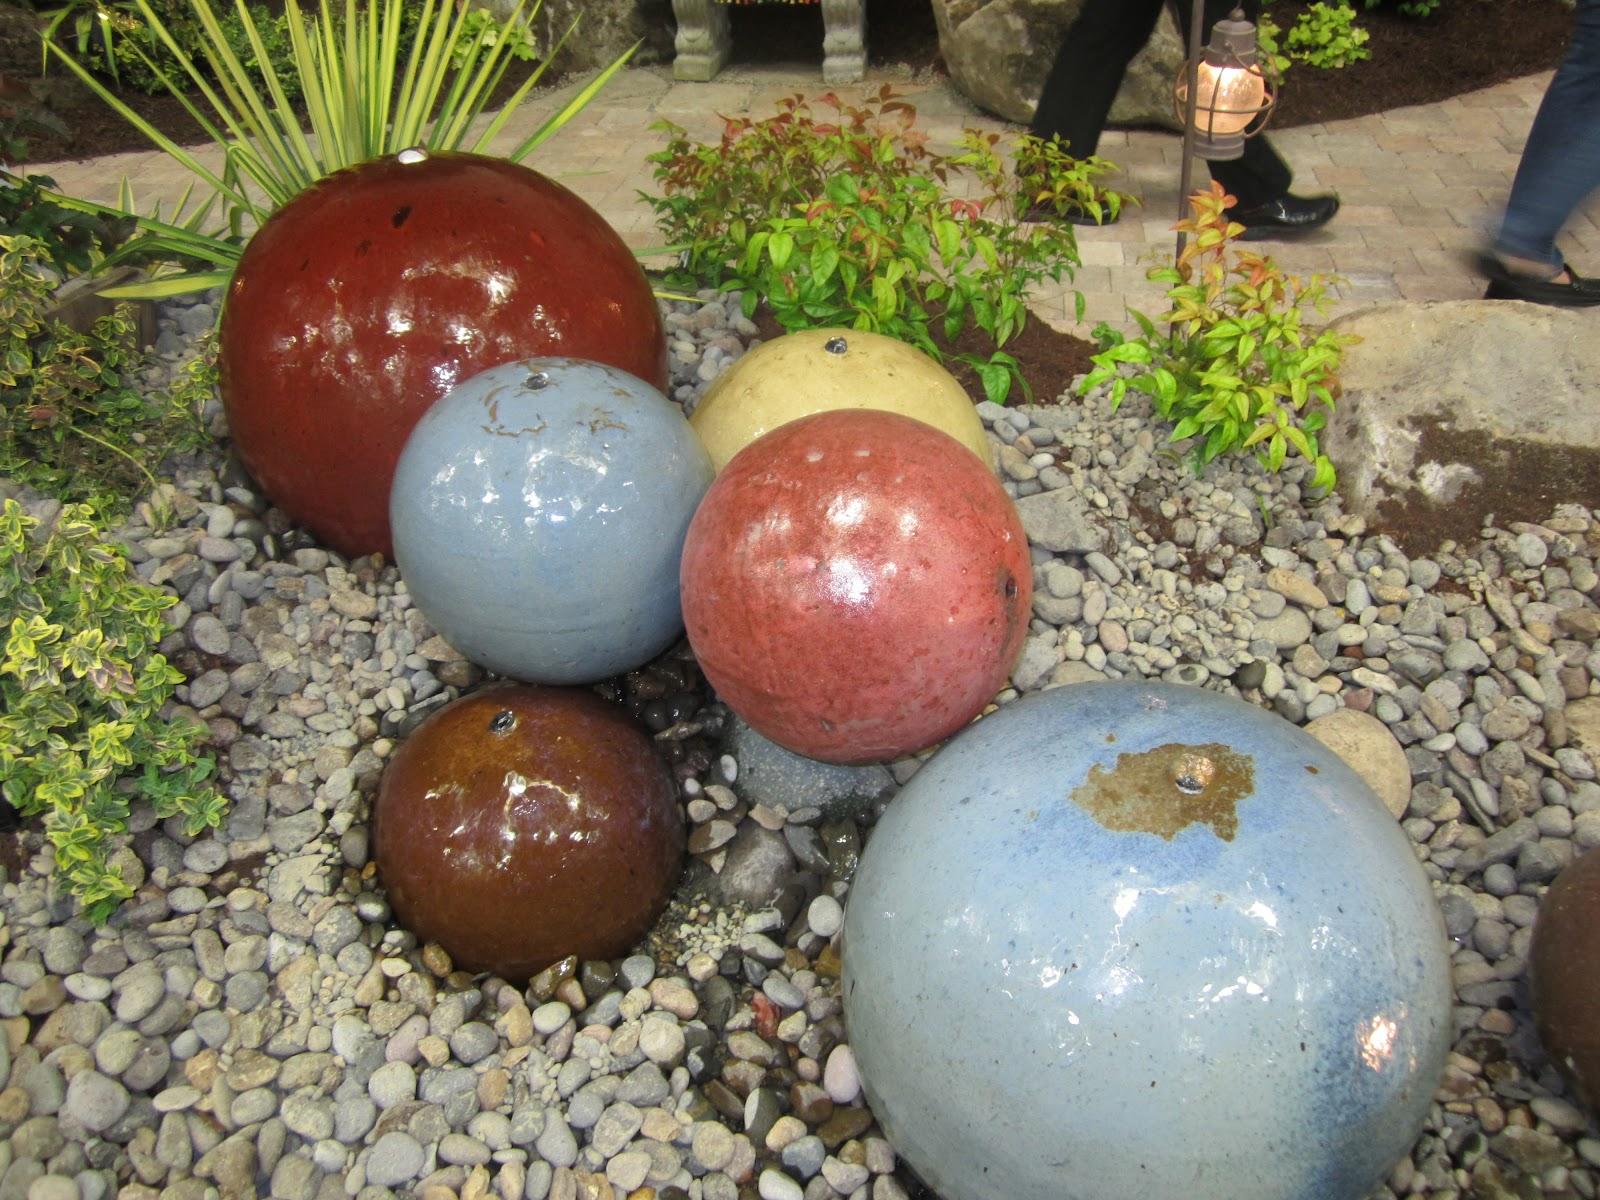 Charming A Few Photos From The Yard, Garden U0026 Patio Show Portland, OR. Each Ceramic  Ball ...